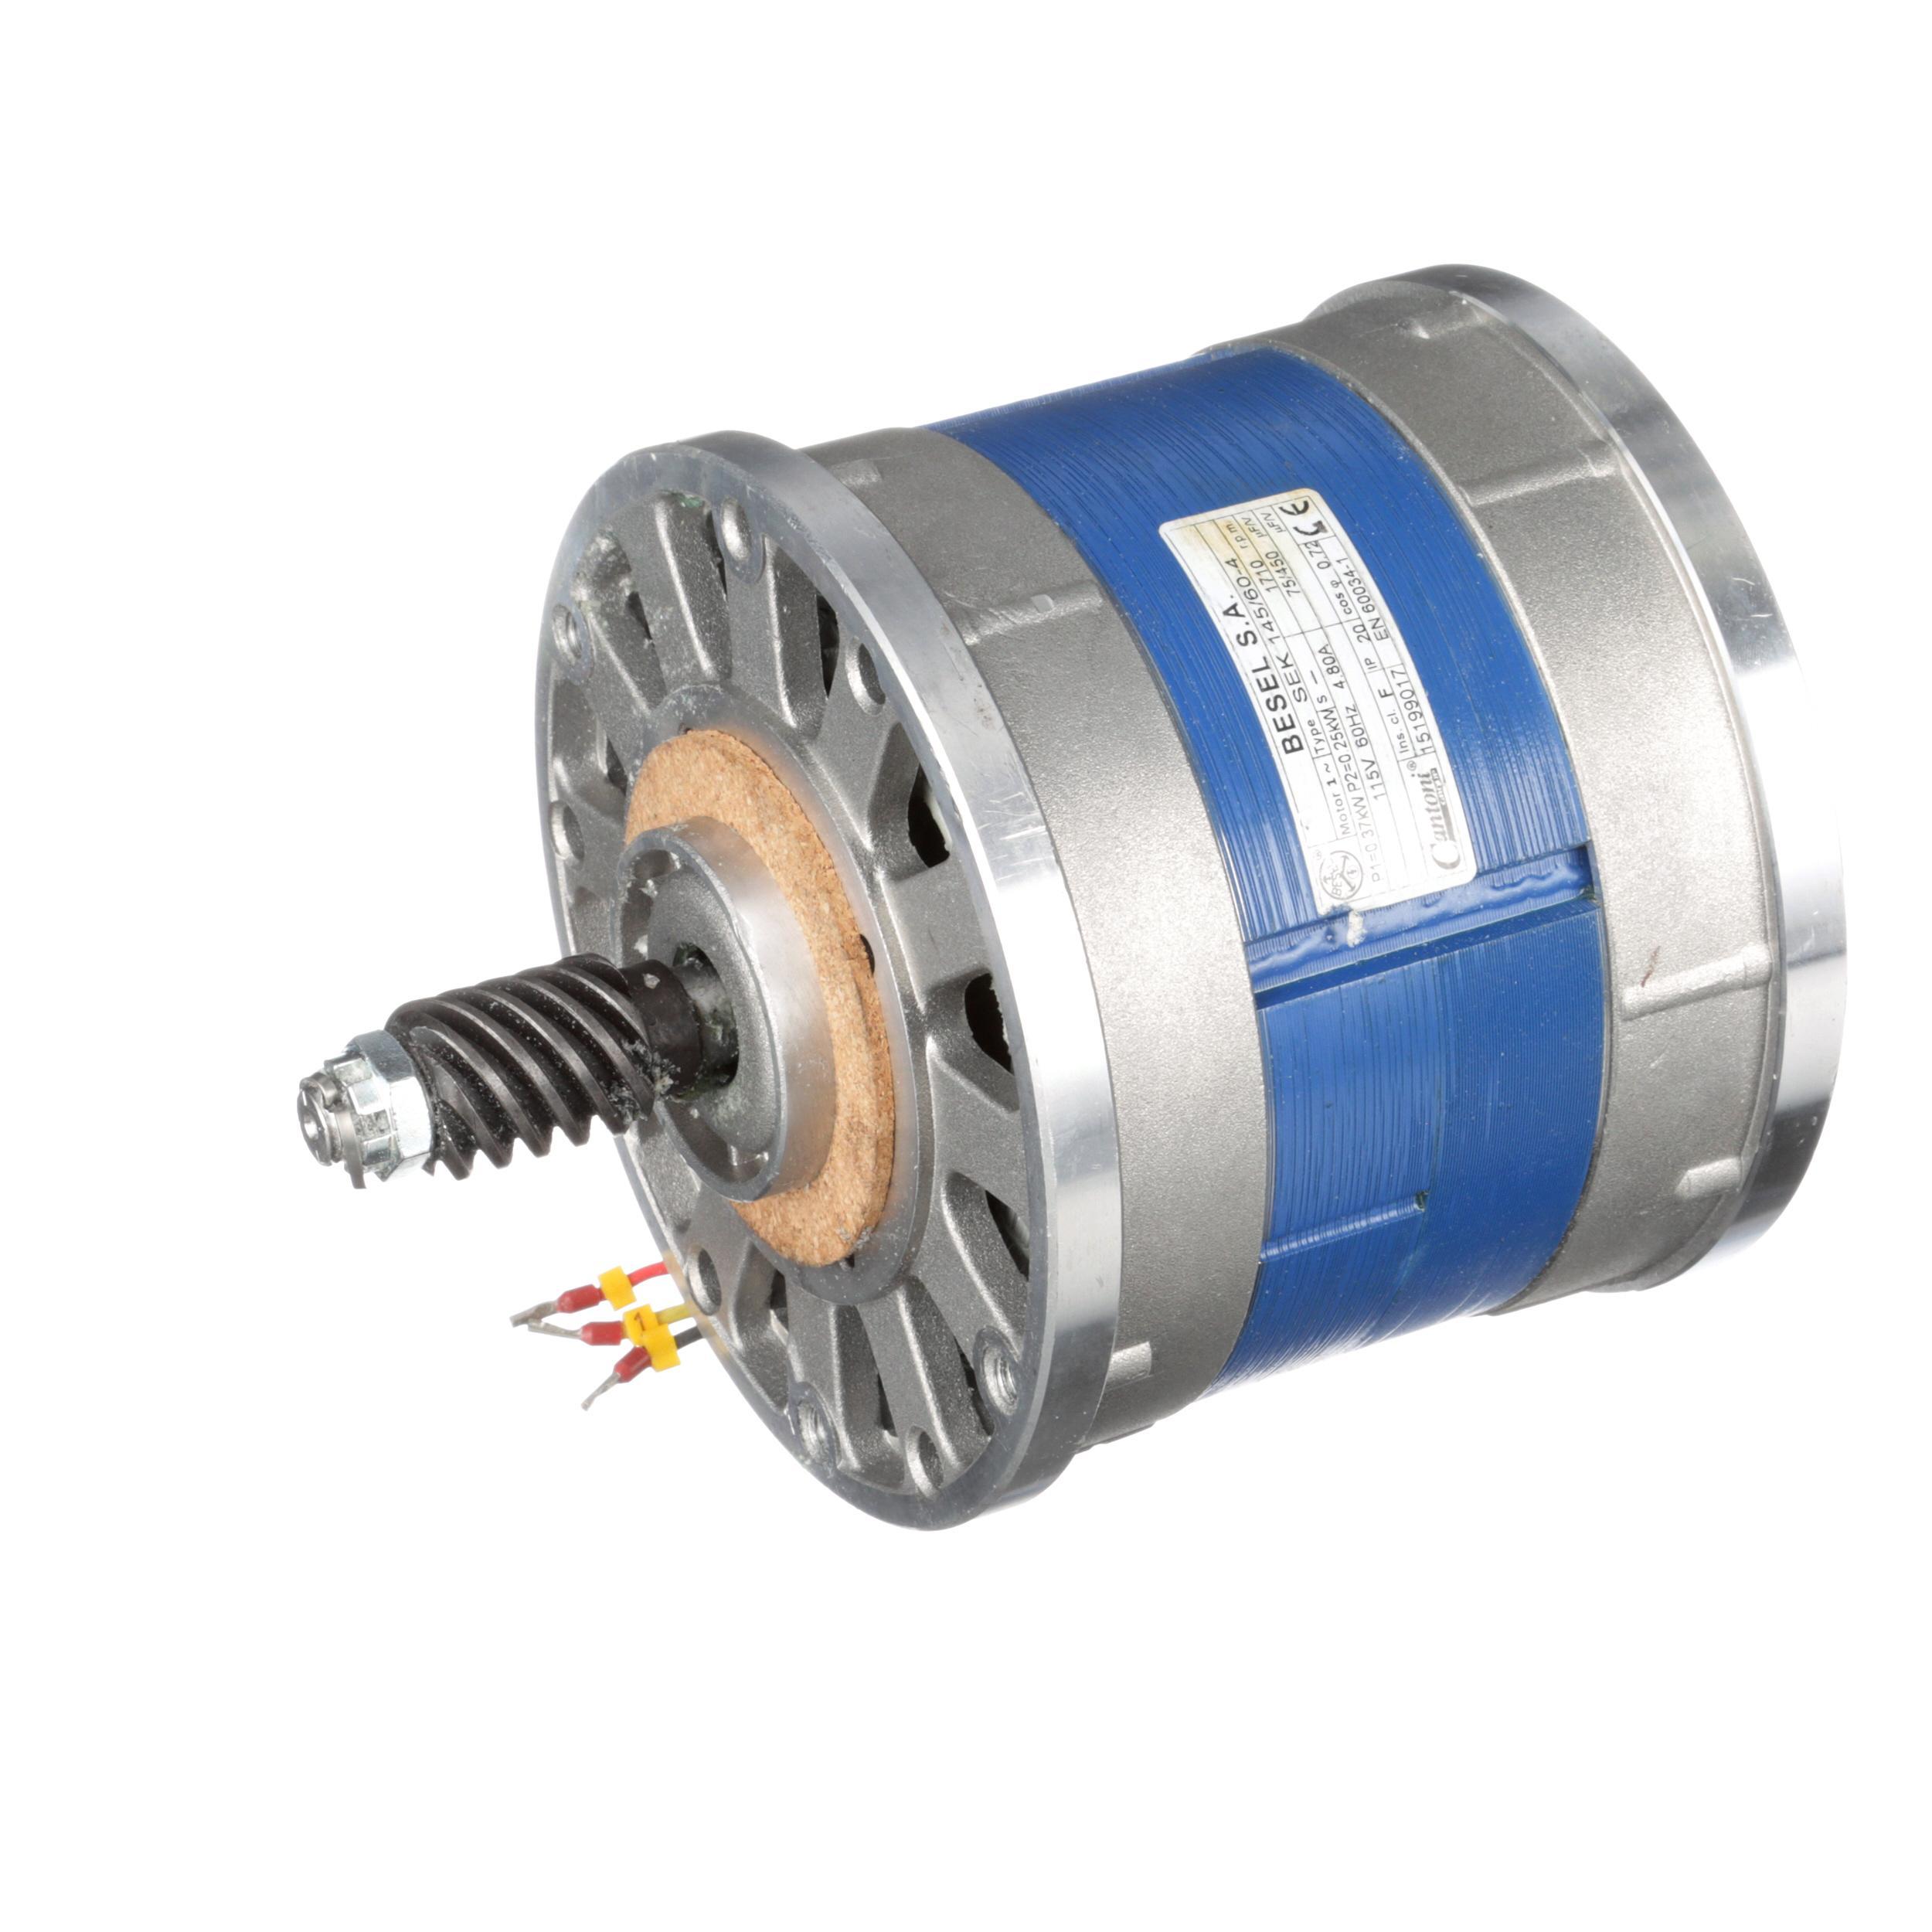 Globe Knife Motor Part A260